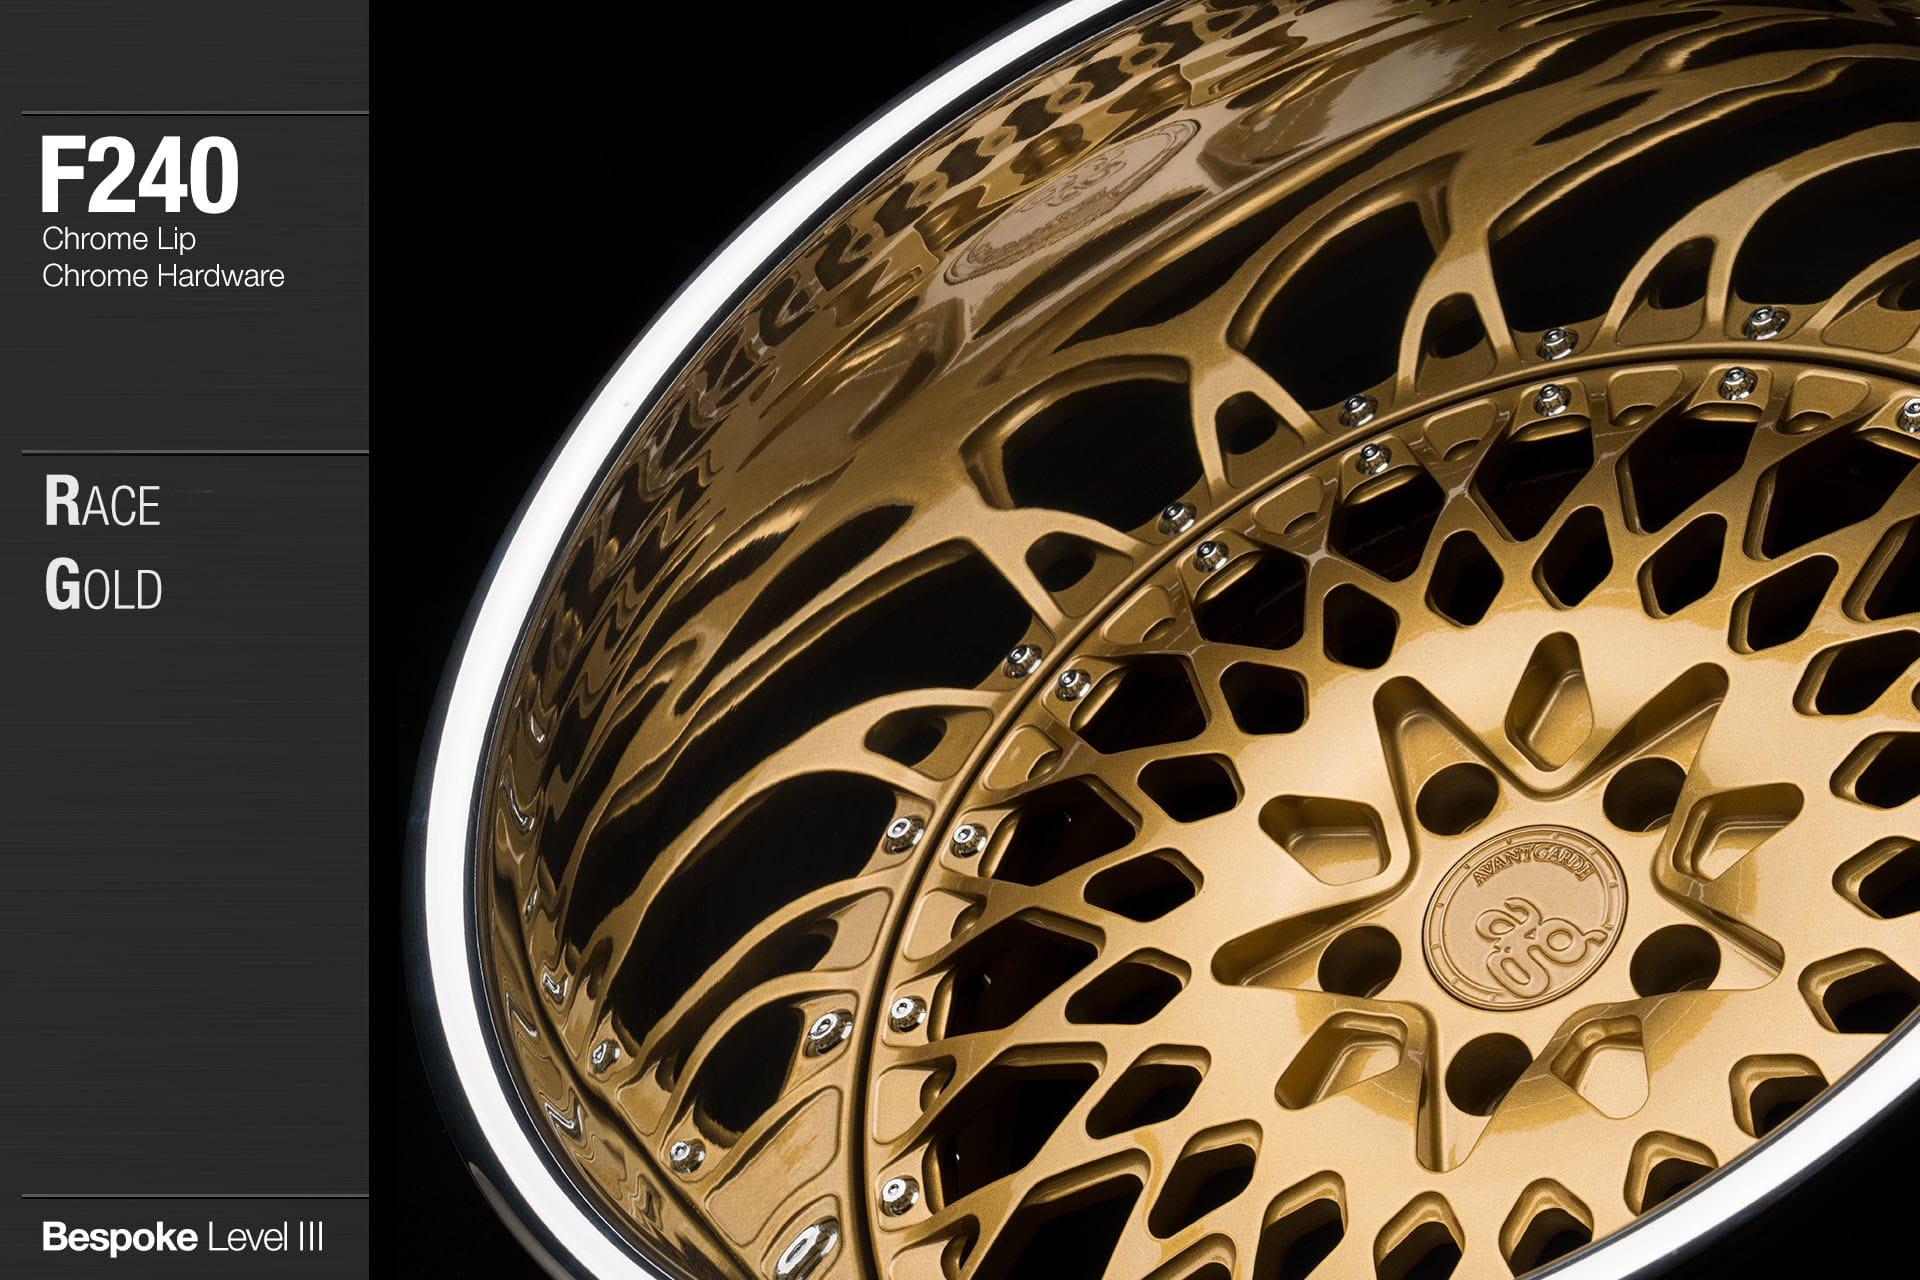 avant garde f240 race gold chrome lip chrome hardware